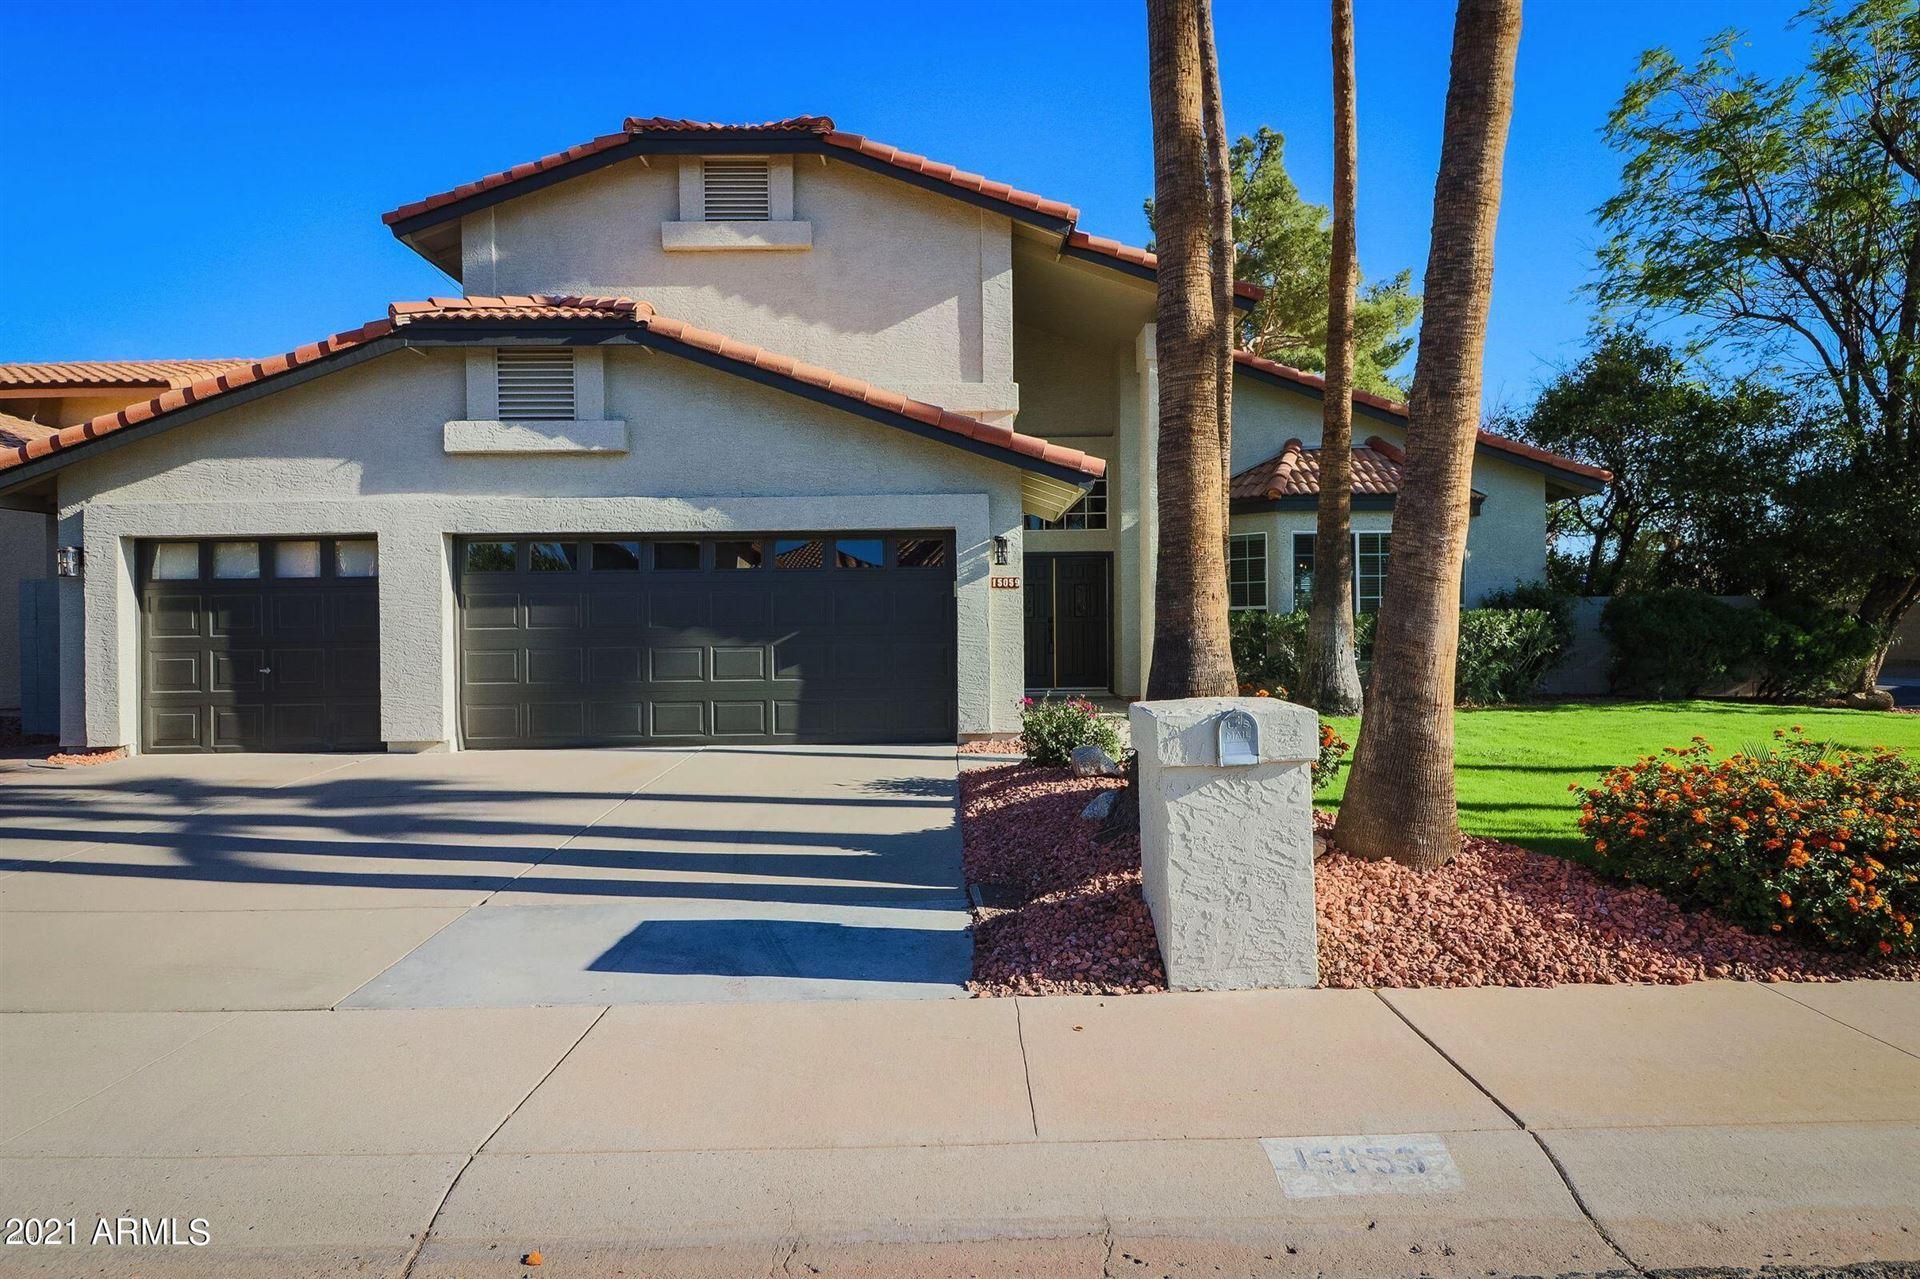 Photo of 15059 N 49TH Way, Scottsdale, AZ 85254 (MLS # 6249612)